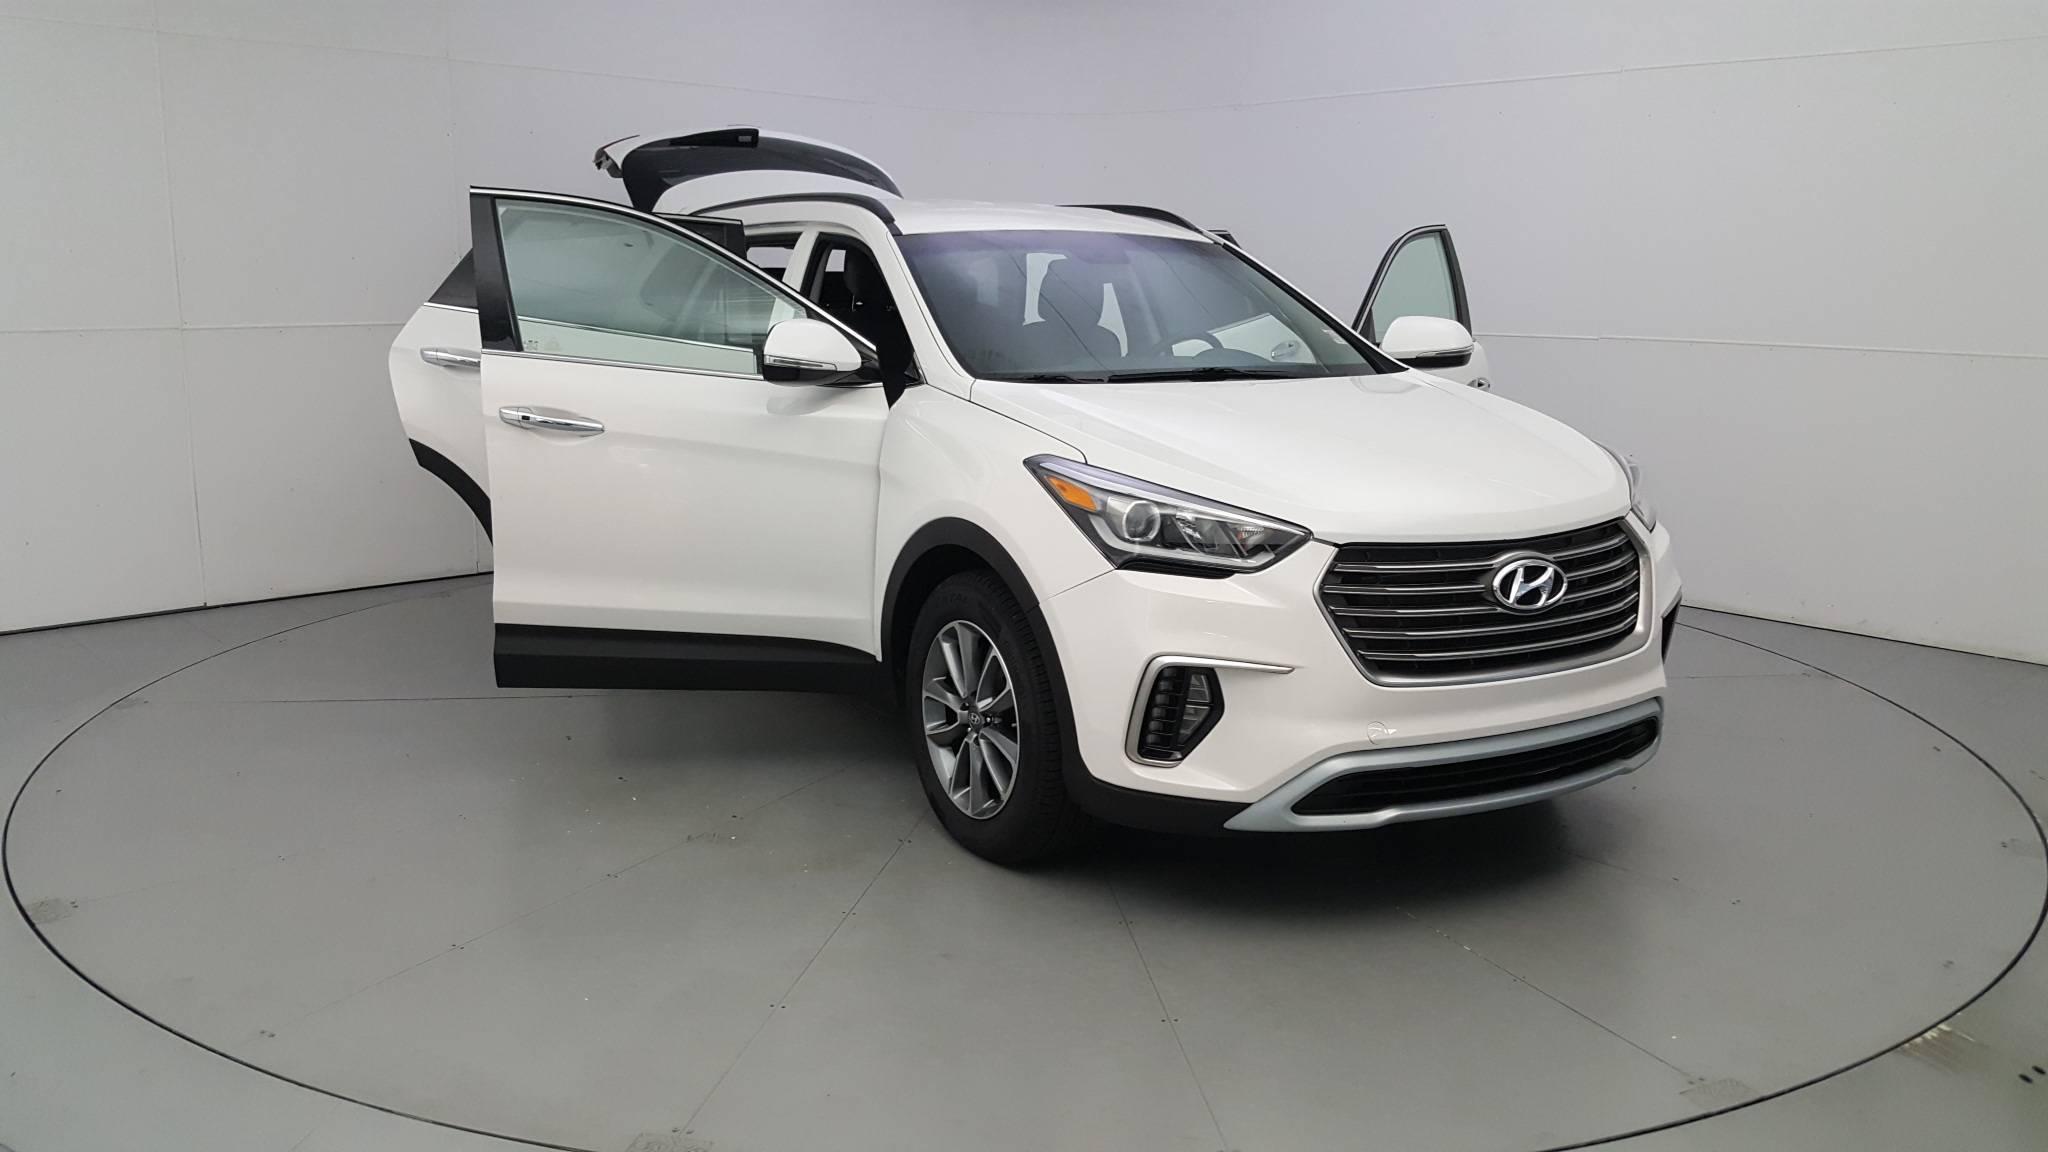 Pre-Owned 2017 Hyundai Santa Fe SE